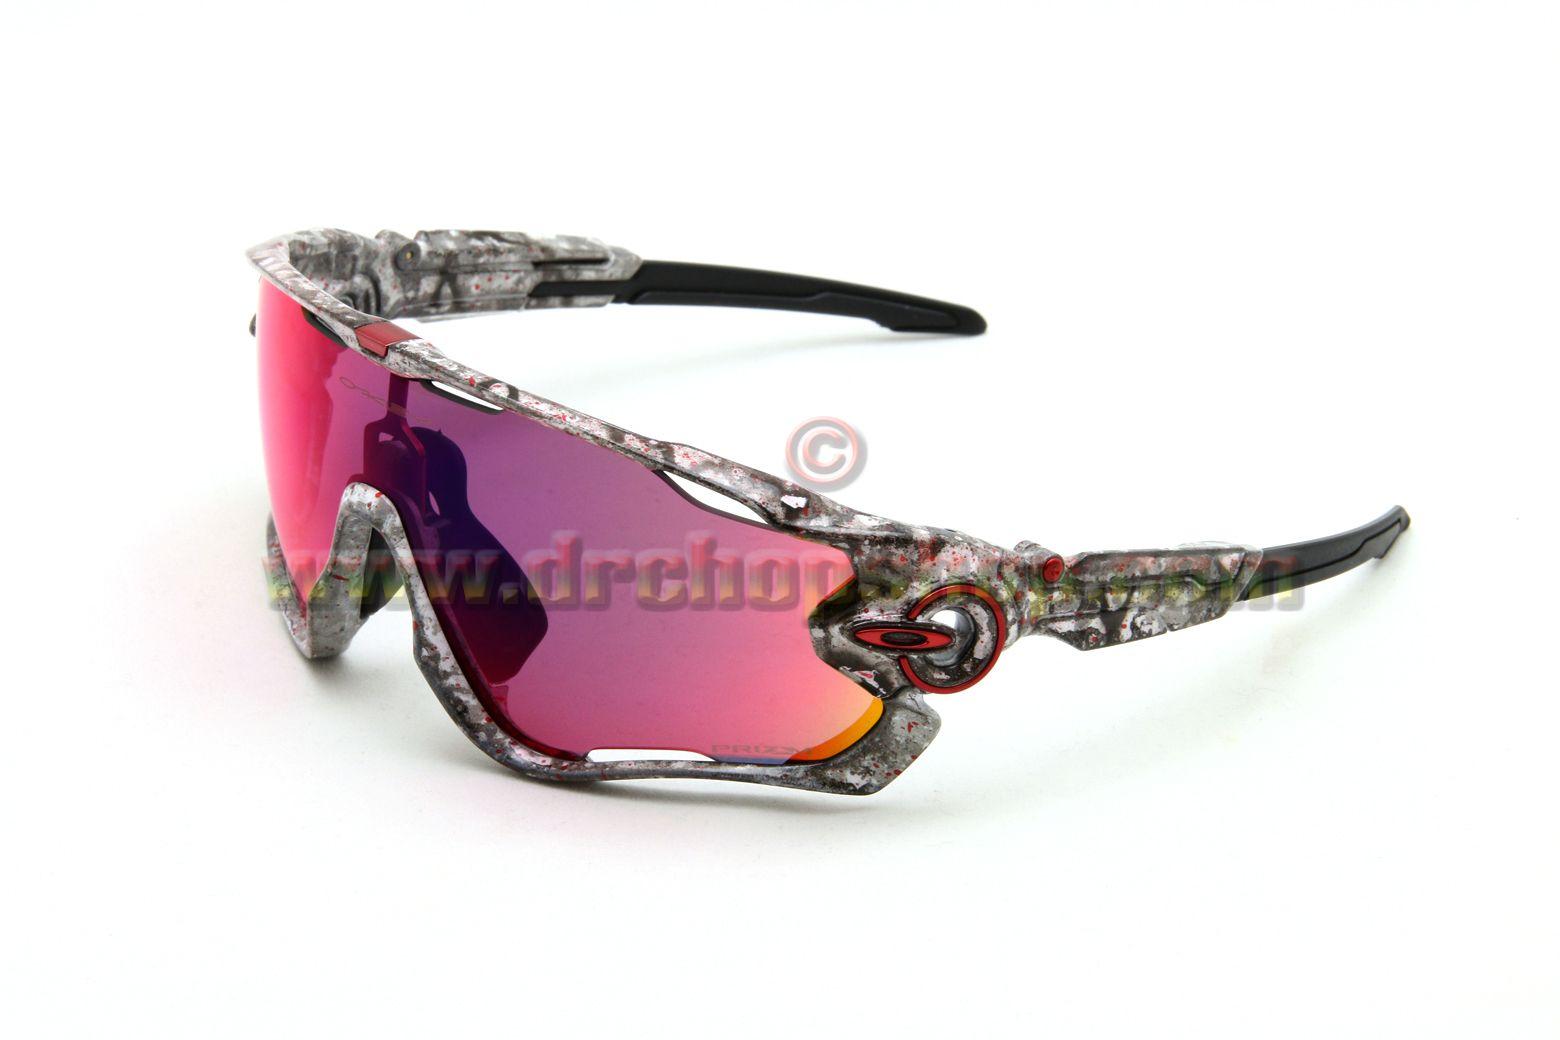 oakley jawbreaker custom | oakley jawbreaker custom | Cycling ...